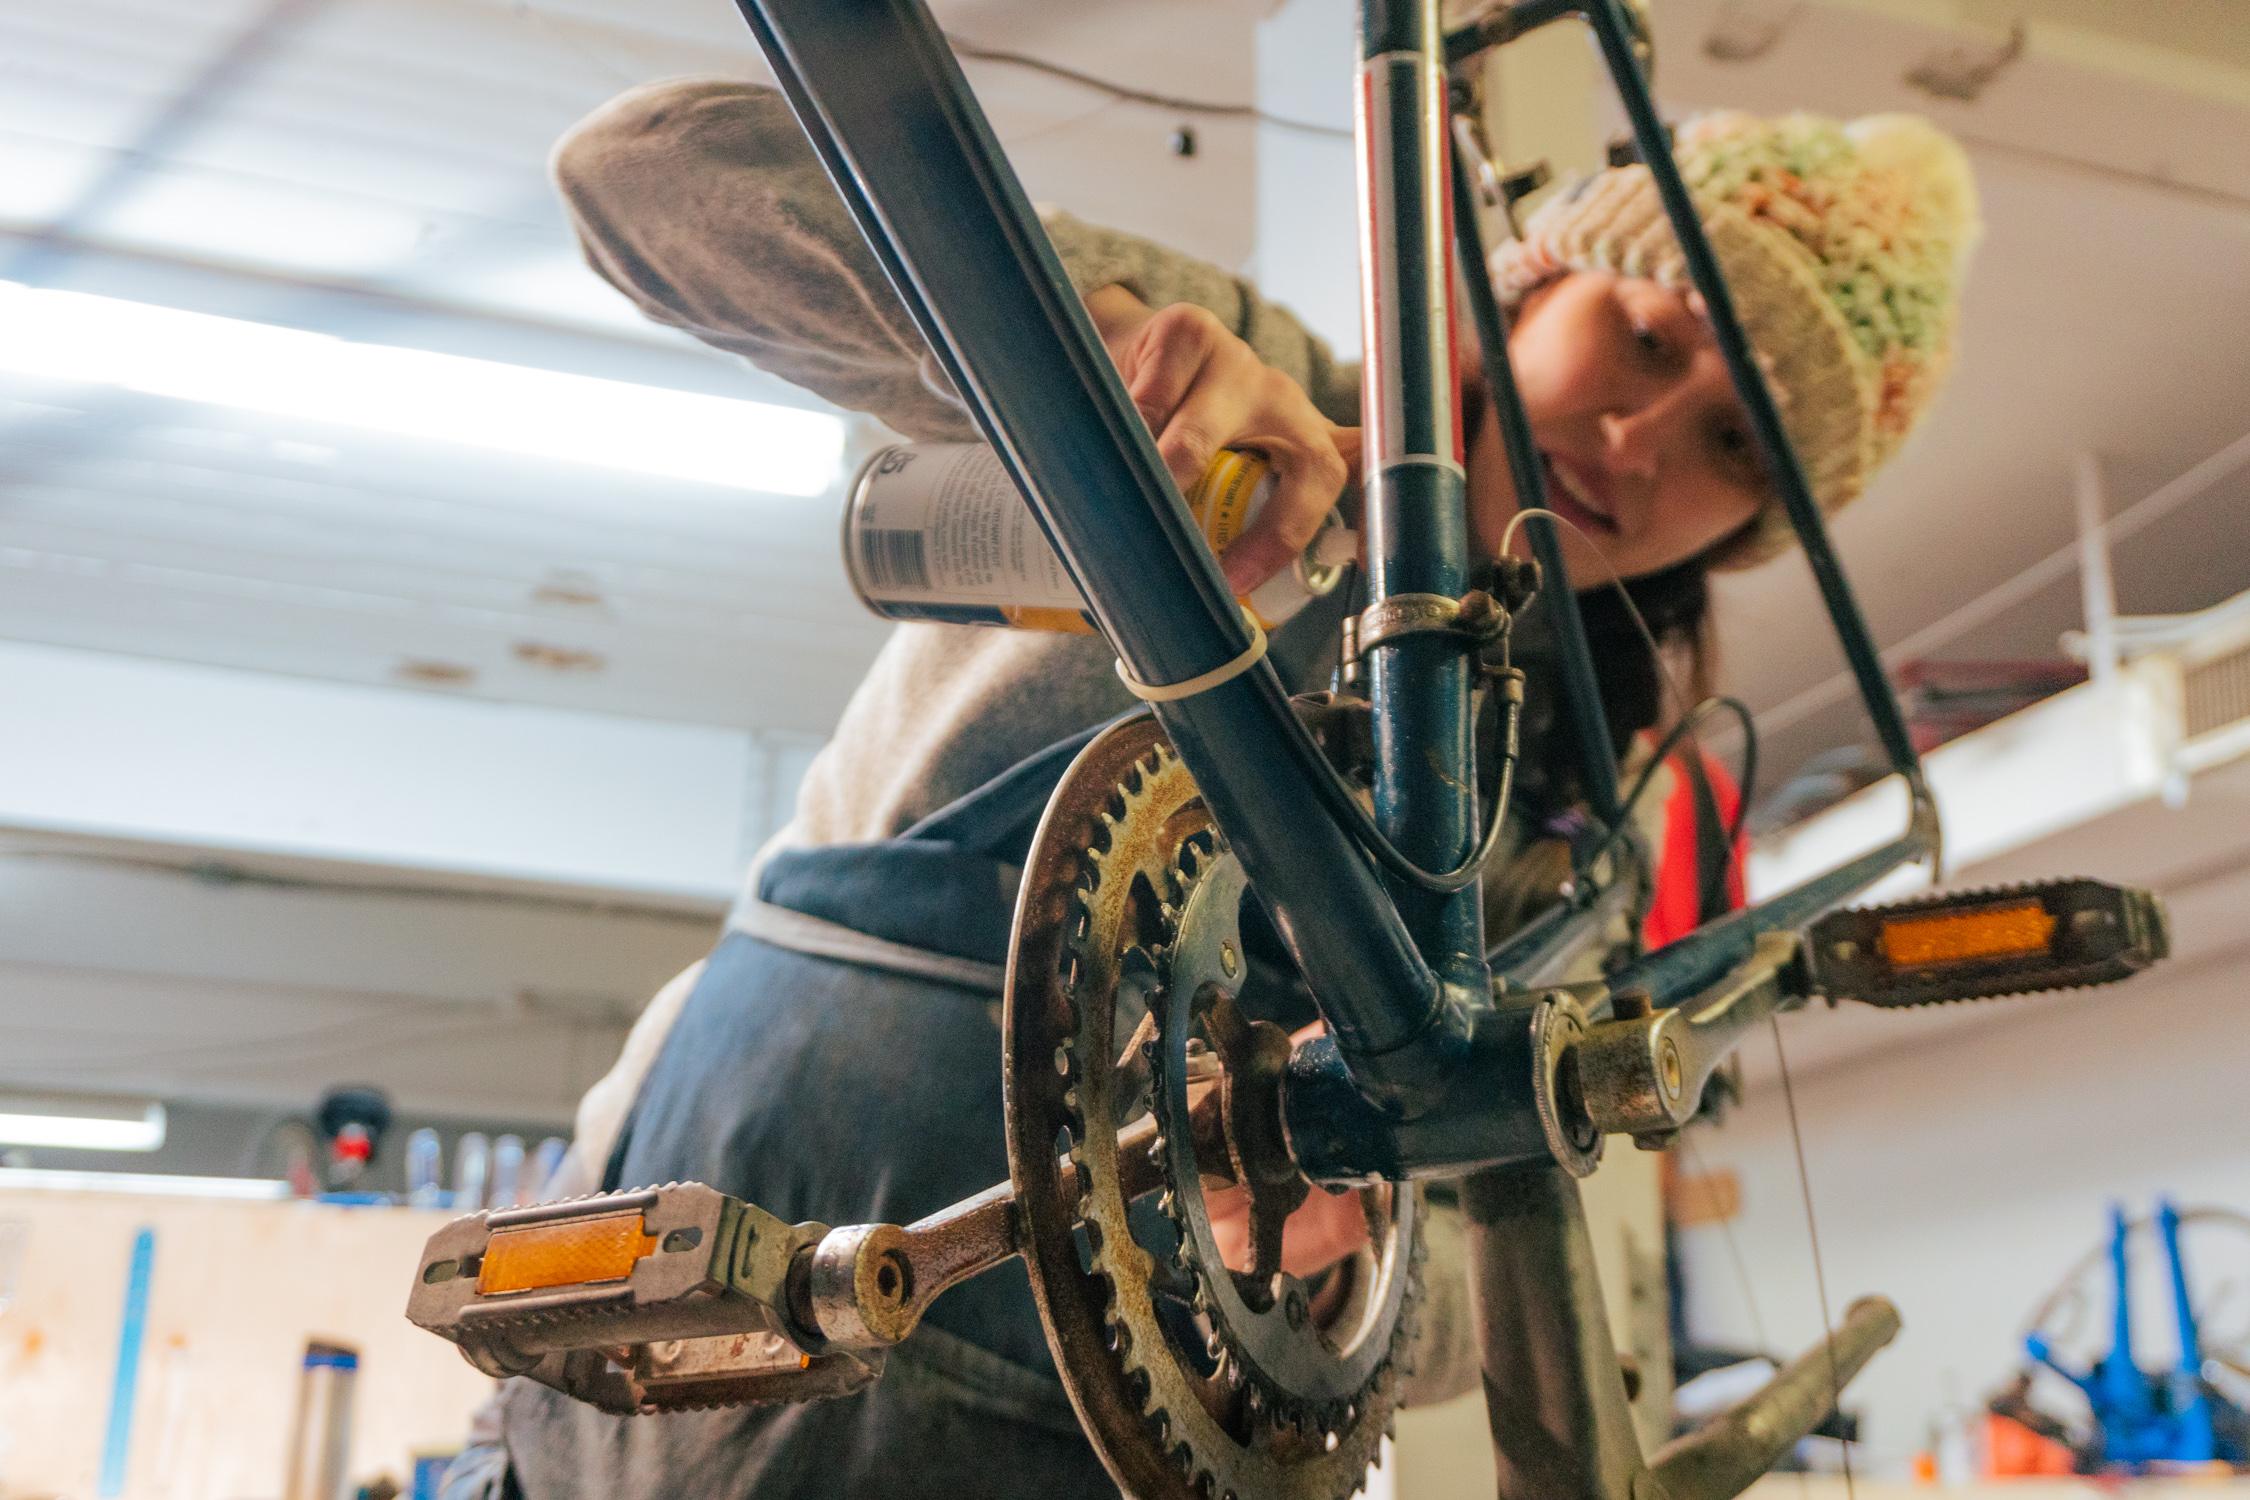 2019-02-01, 24hr Bike Repair Marathon_COMPRESSED-22.jpg